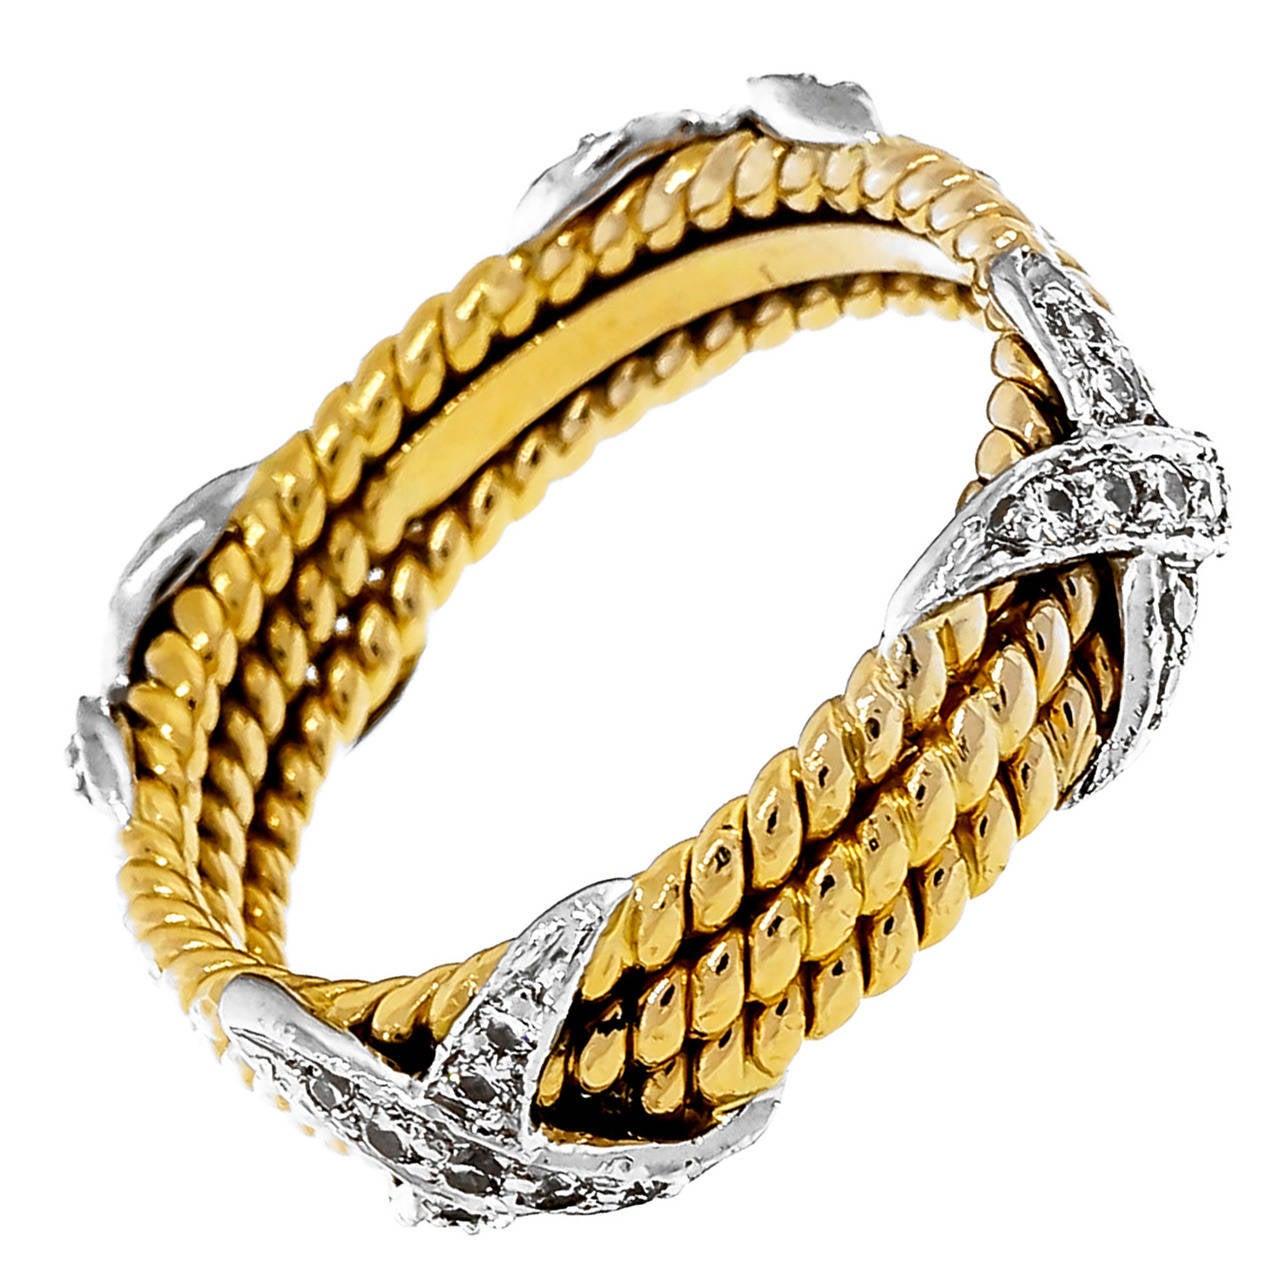 13de88be54c8c Tiffany & Co. Schlumberger Diamond Gold Platinum Three Row Rope X Ring